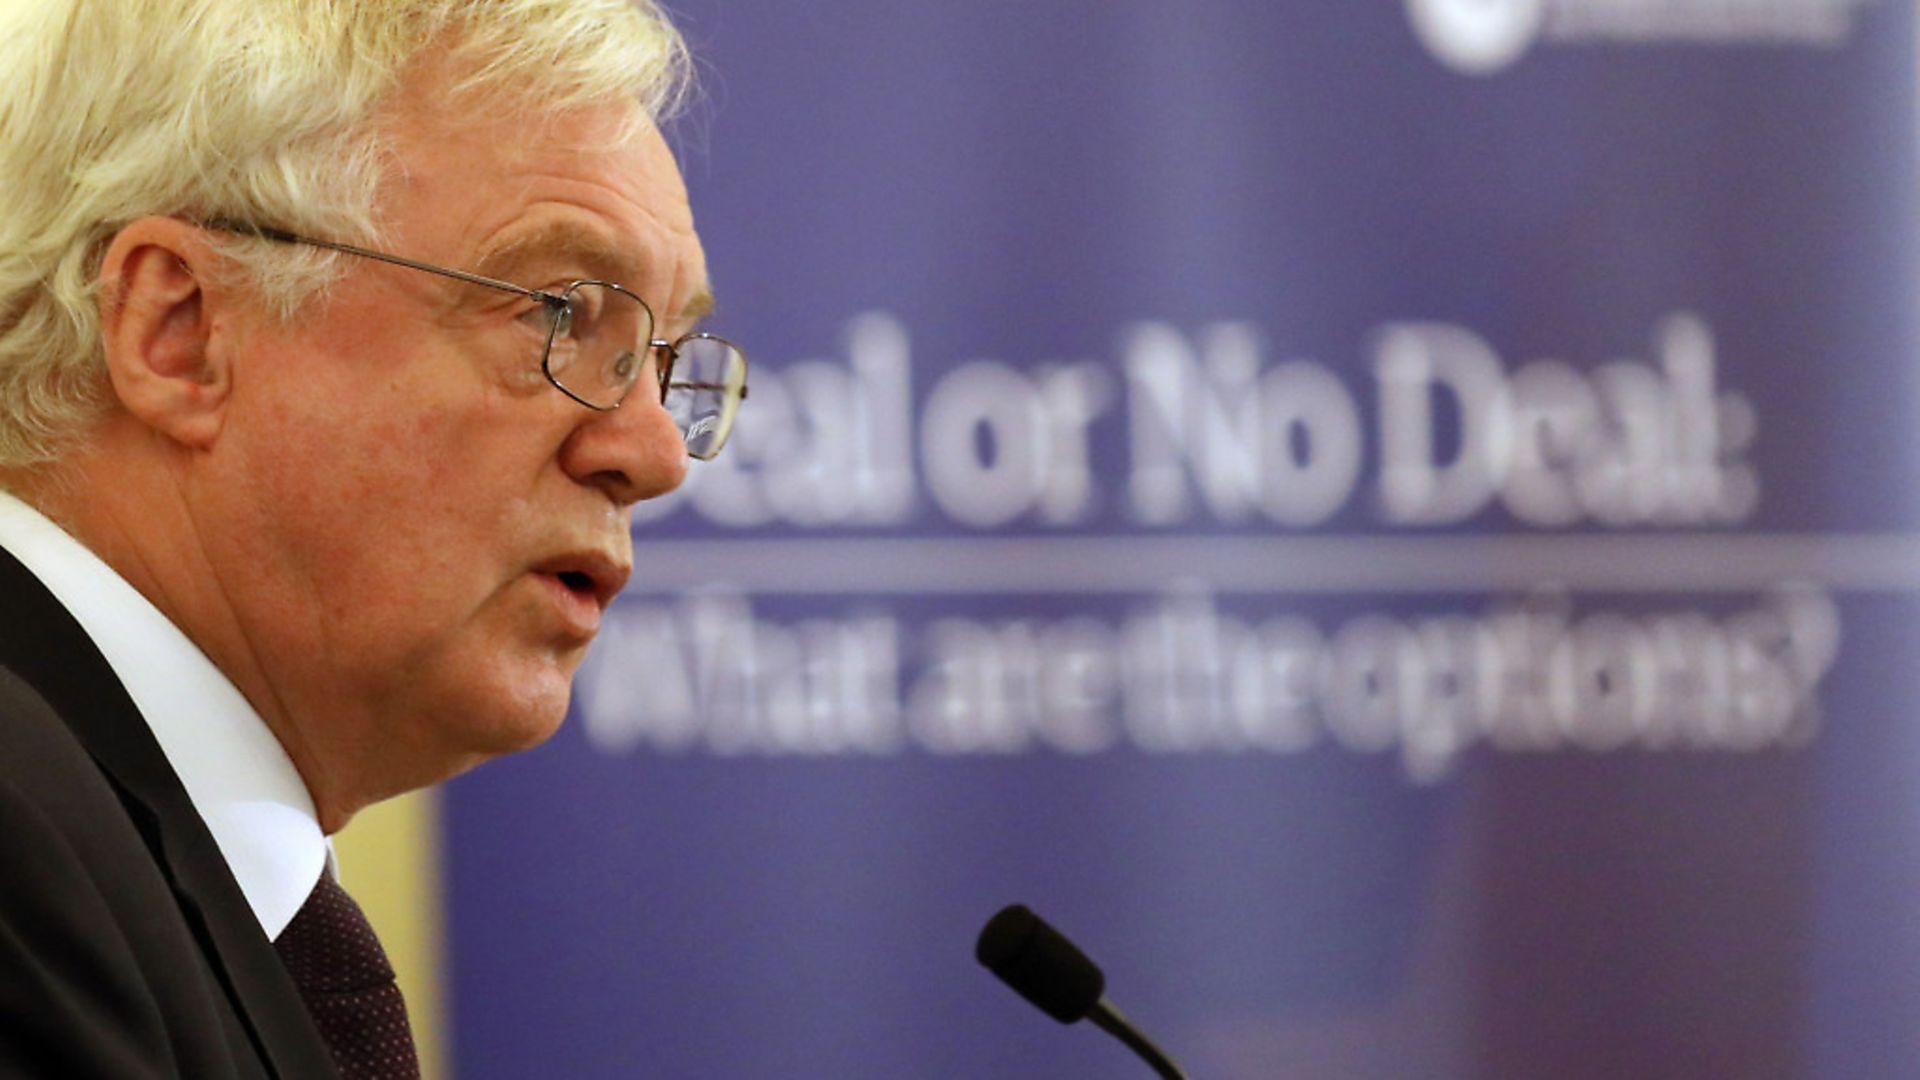 Does Brexit Secretary David Davis have no shame? - Credit: PA Wire/PA Images